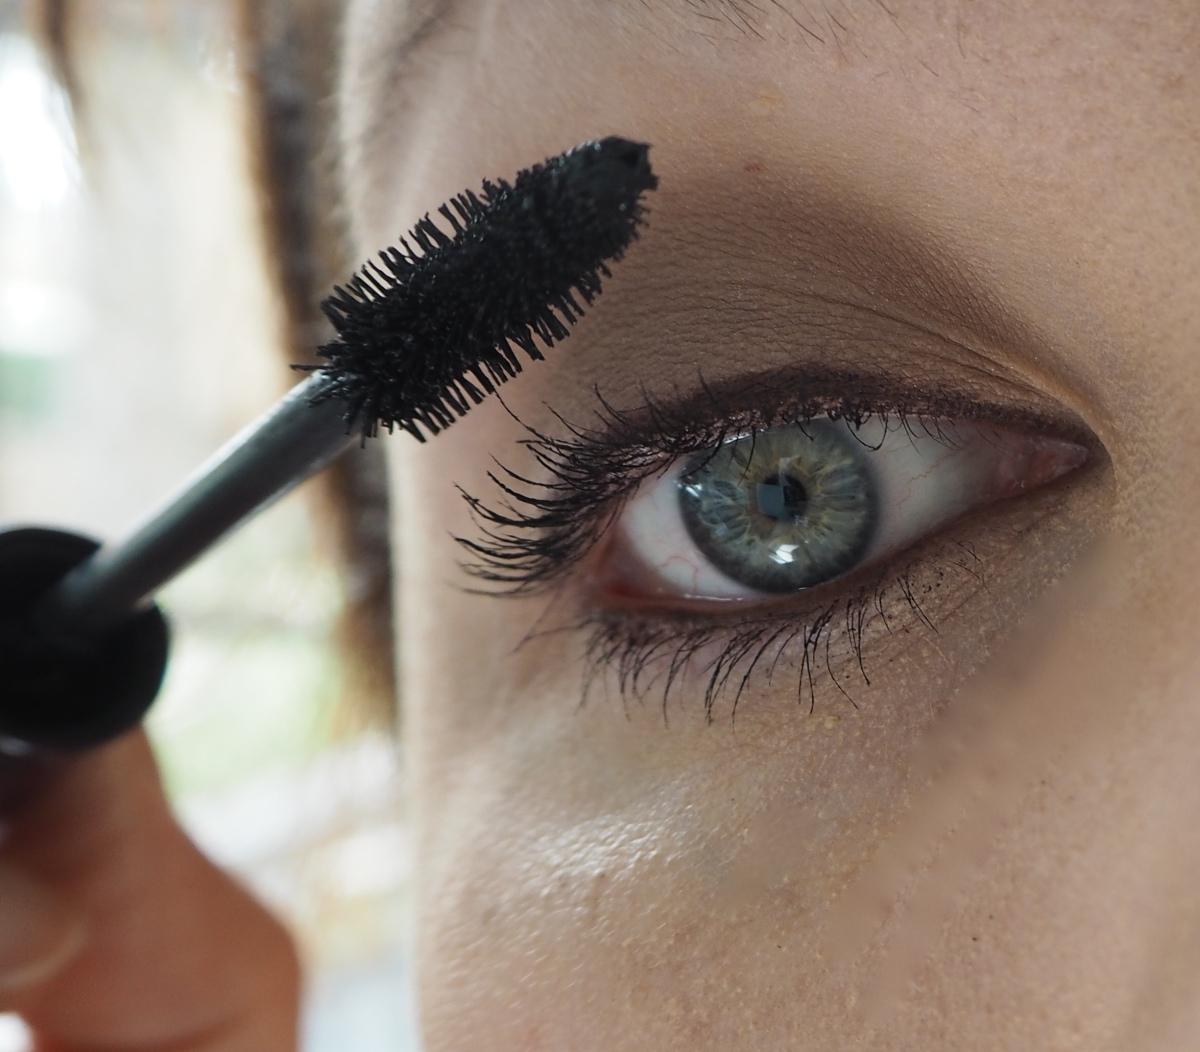 urban decay naked palette 2 tutorial pretty green eyes blue eyes charlotte tilbury mascara Rosie for autograph eyeliner